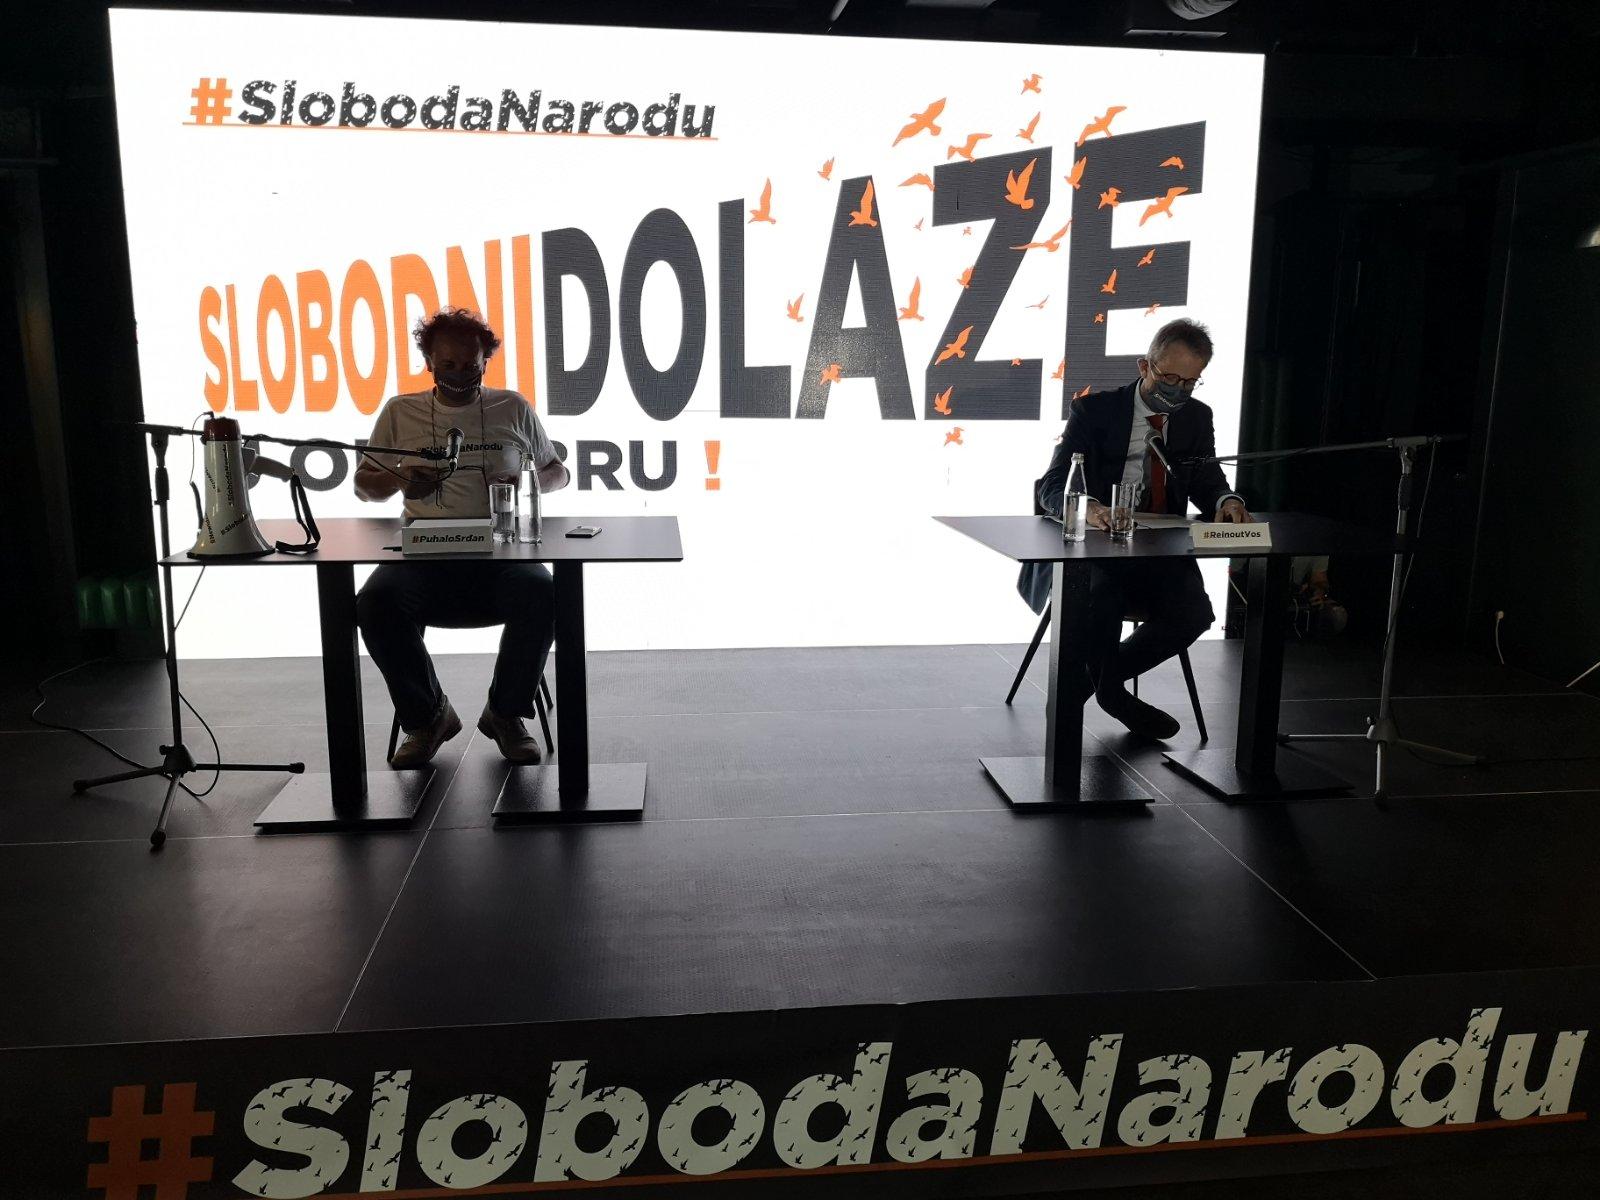 Festival 'Sloboda narodu' okuplja slobodnomisleće ljude Balkana